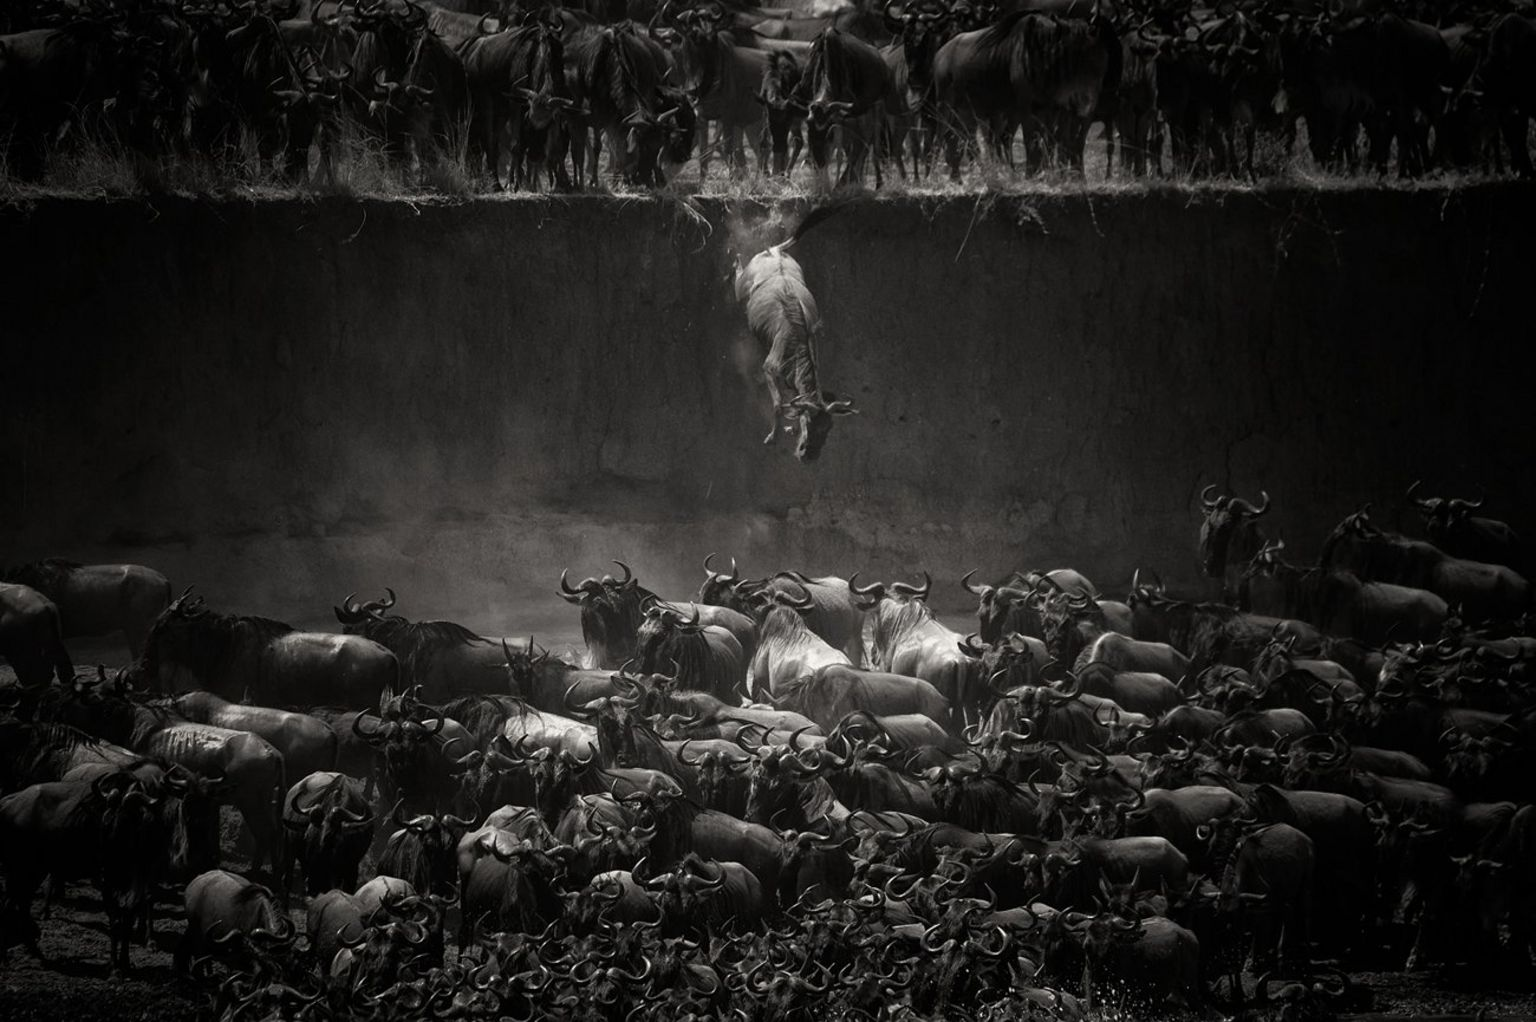 Wildebeest - Mara river, North Serengeti